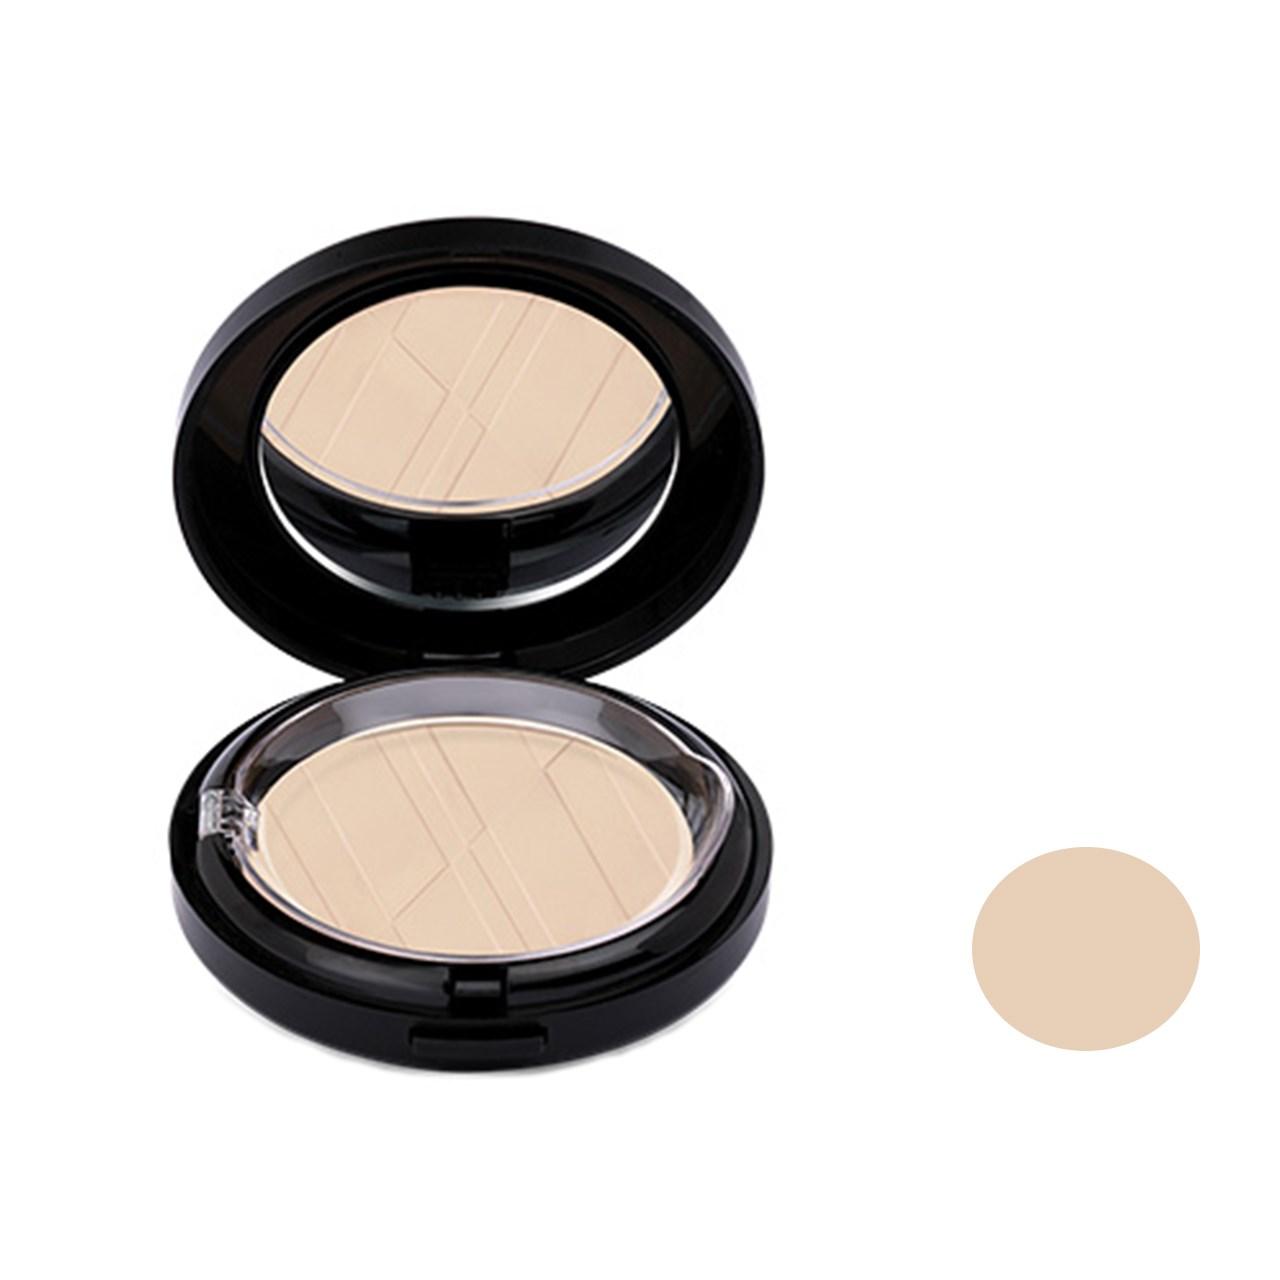 قیمت پنکیک گلدن رز مدل Matte face powder شماره 01